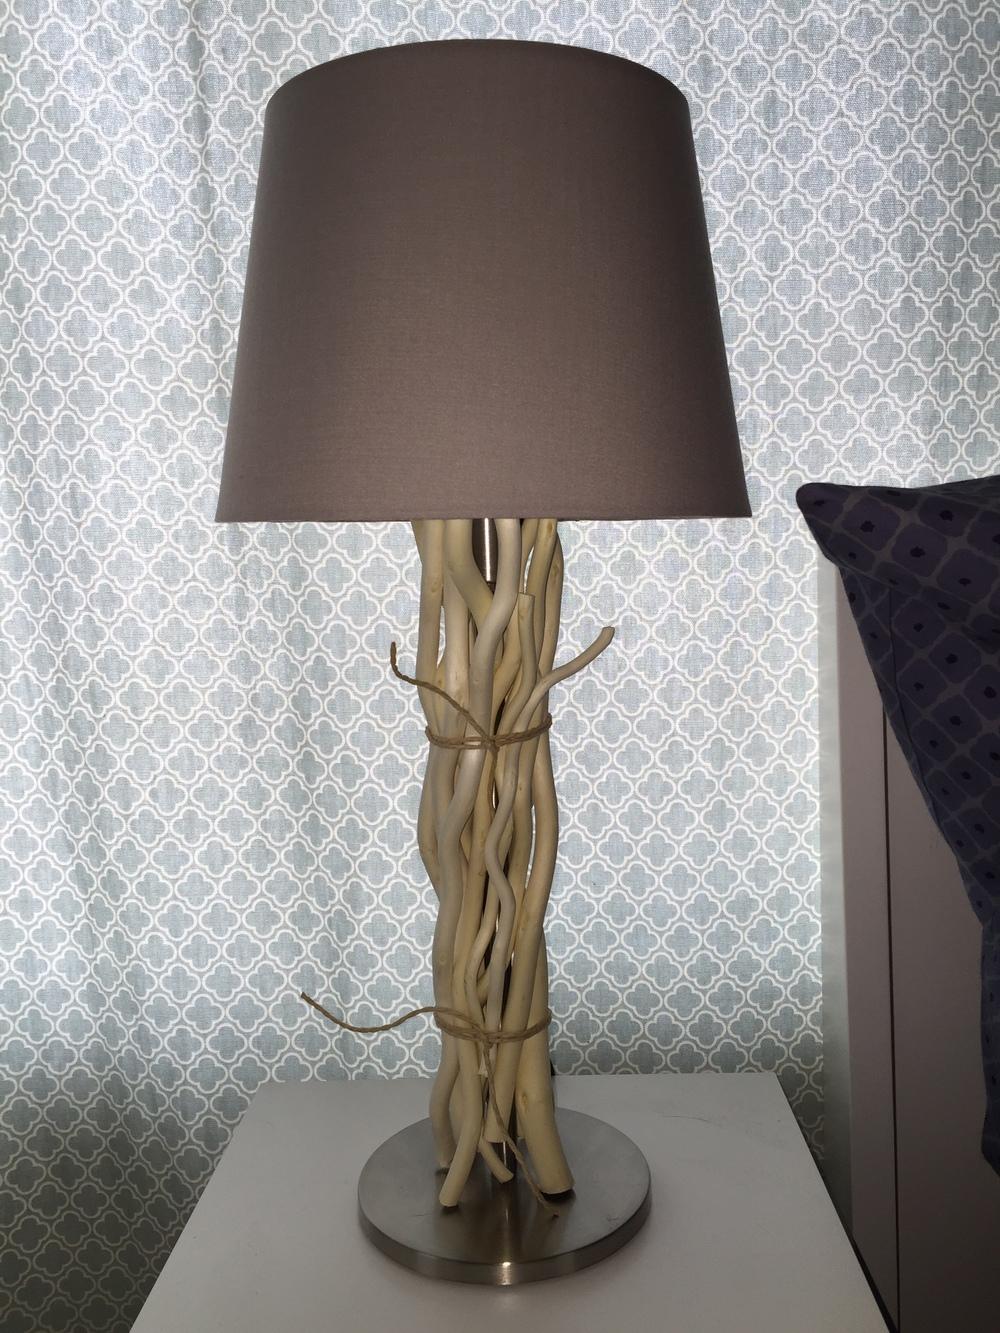 Driftwood lamps ikea hackers ikea hackers - Diy Driftwood Lamps Ikea Hack Stephanie Mae Foster